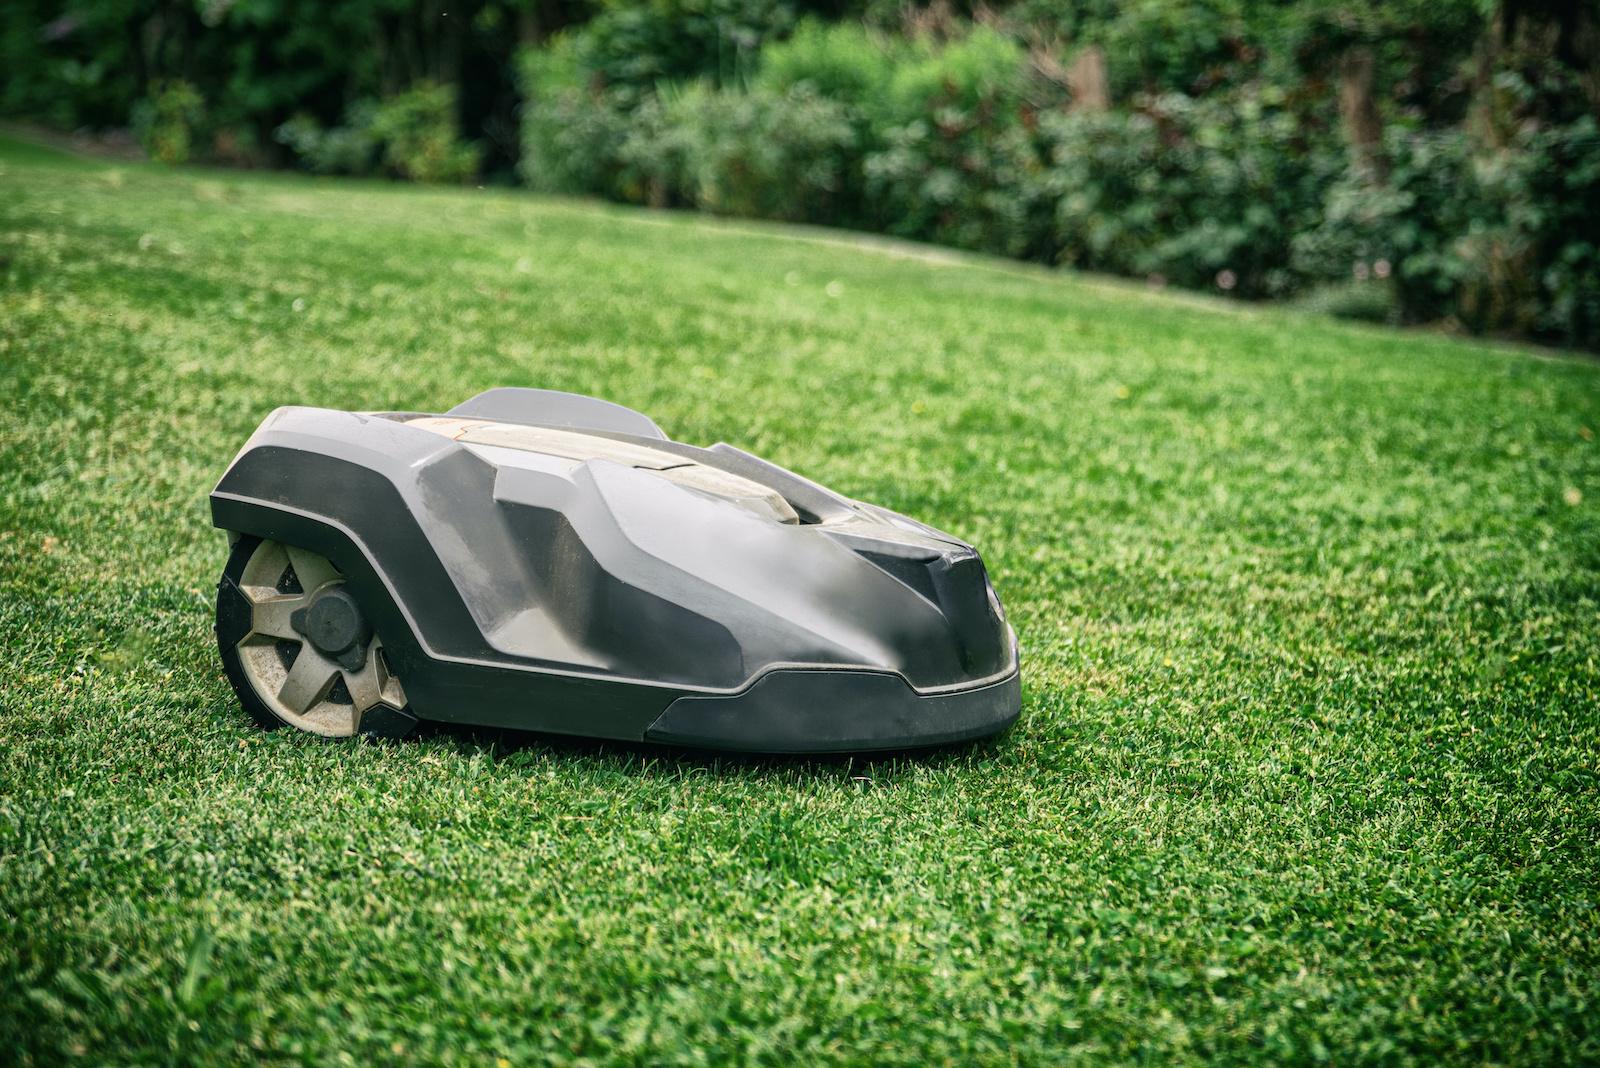 Mähroboter auf Rasen